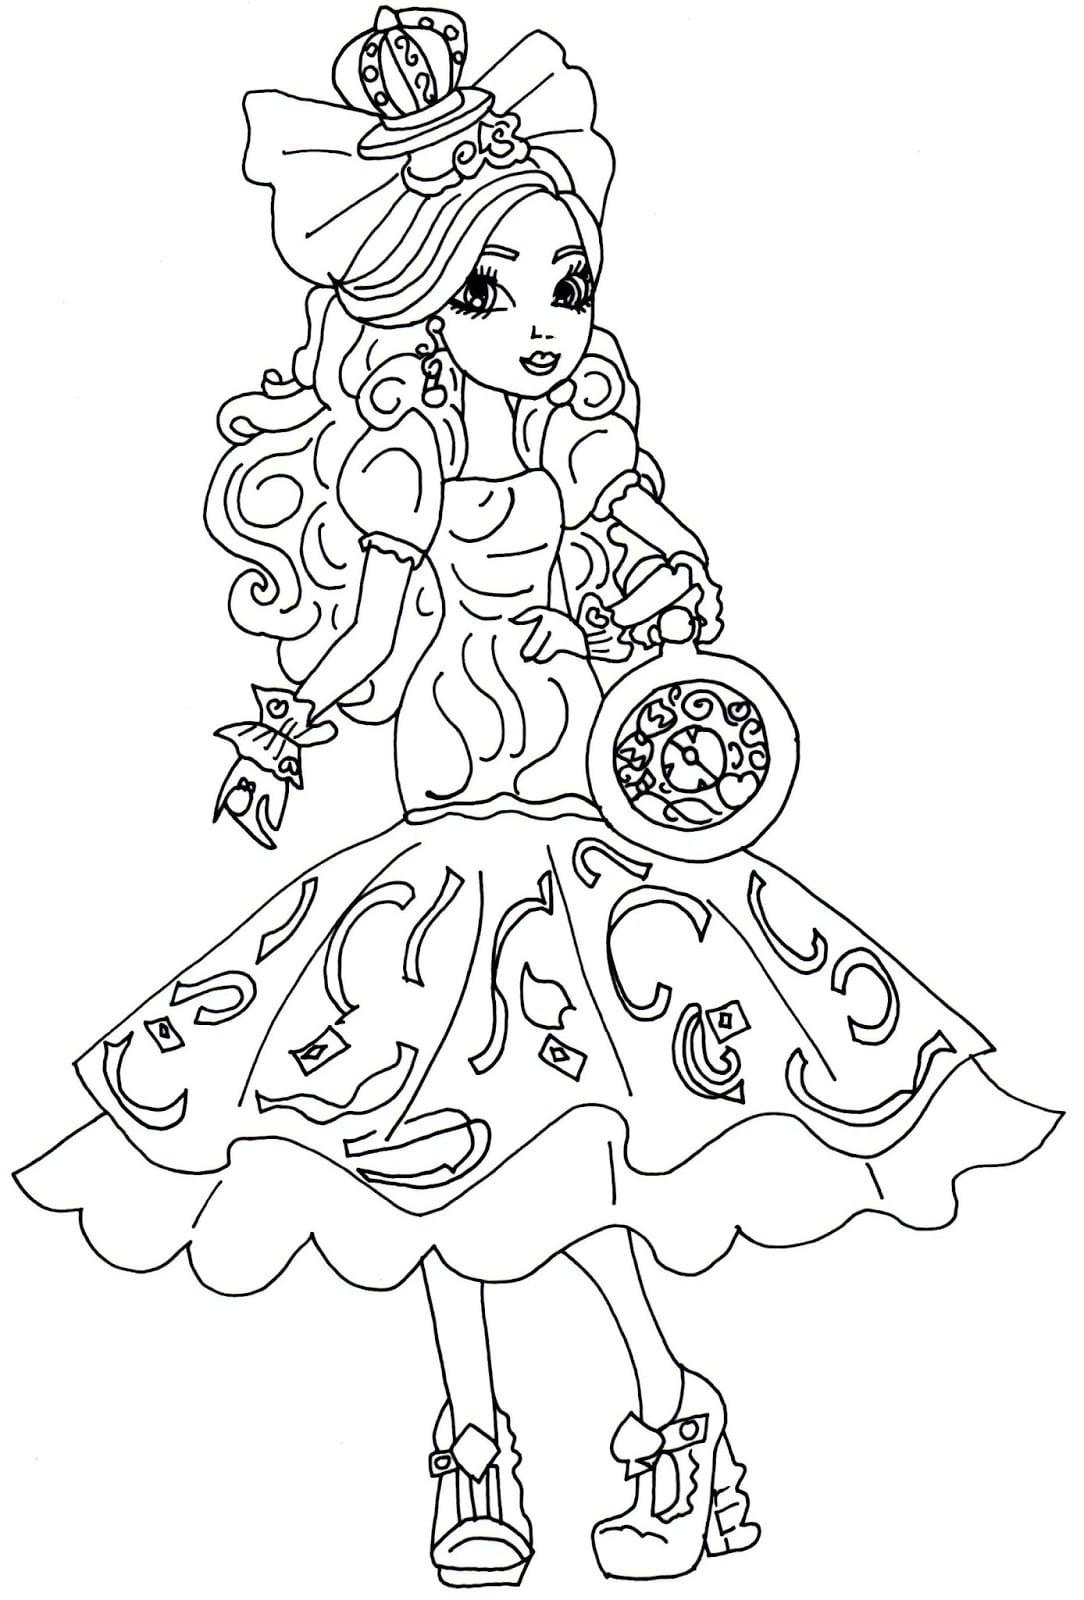 Desenho De Kitty Cheshire De Ever After High Para Colorir